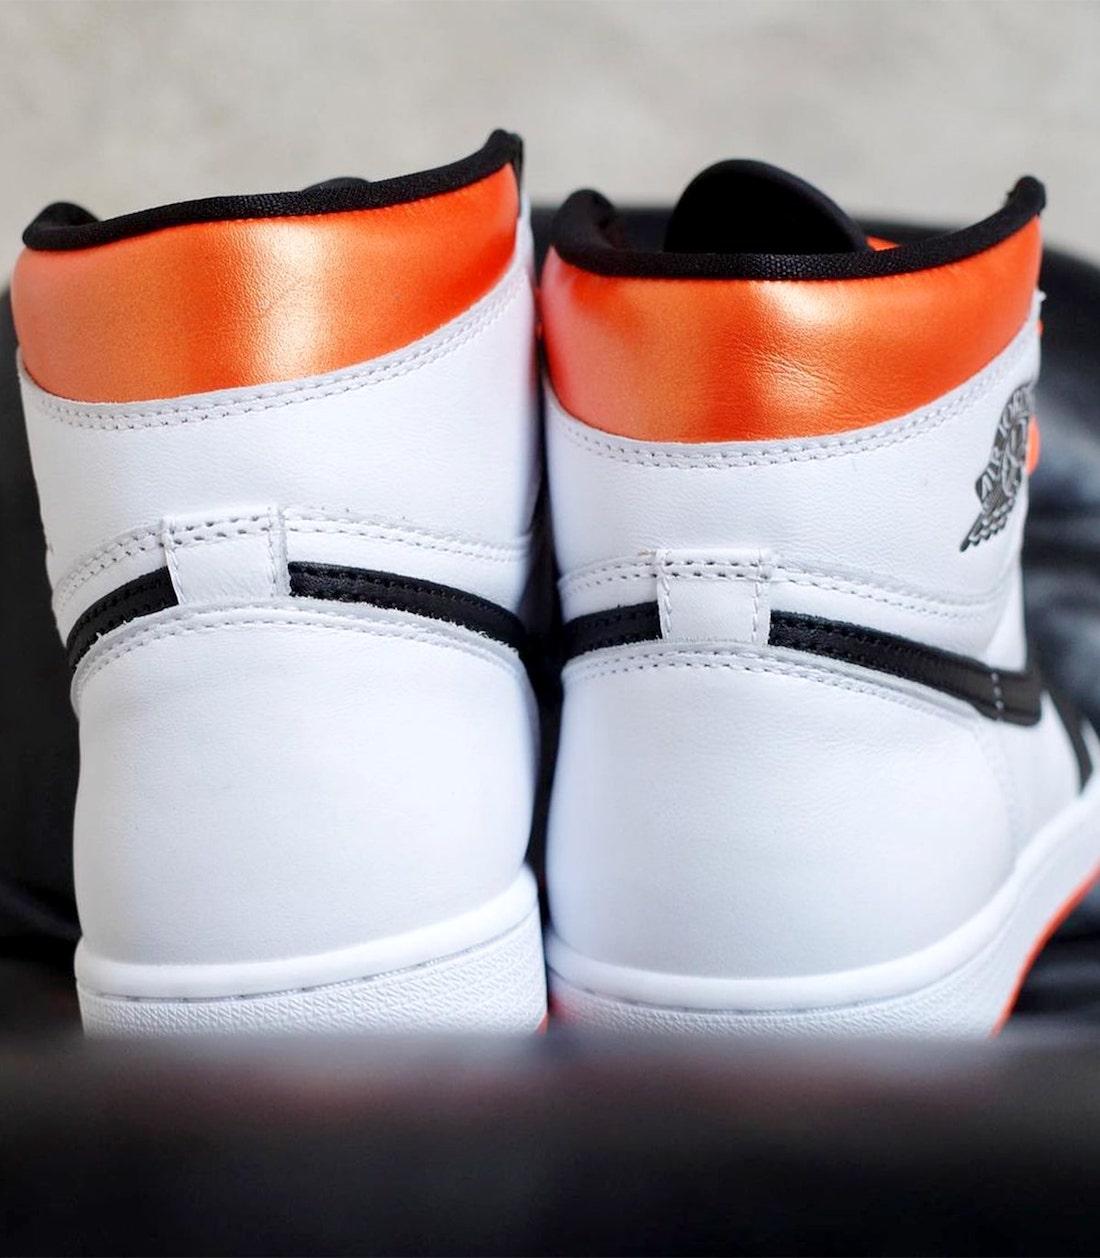 Air Jordan 1 Electro Orange Release 555088-180